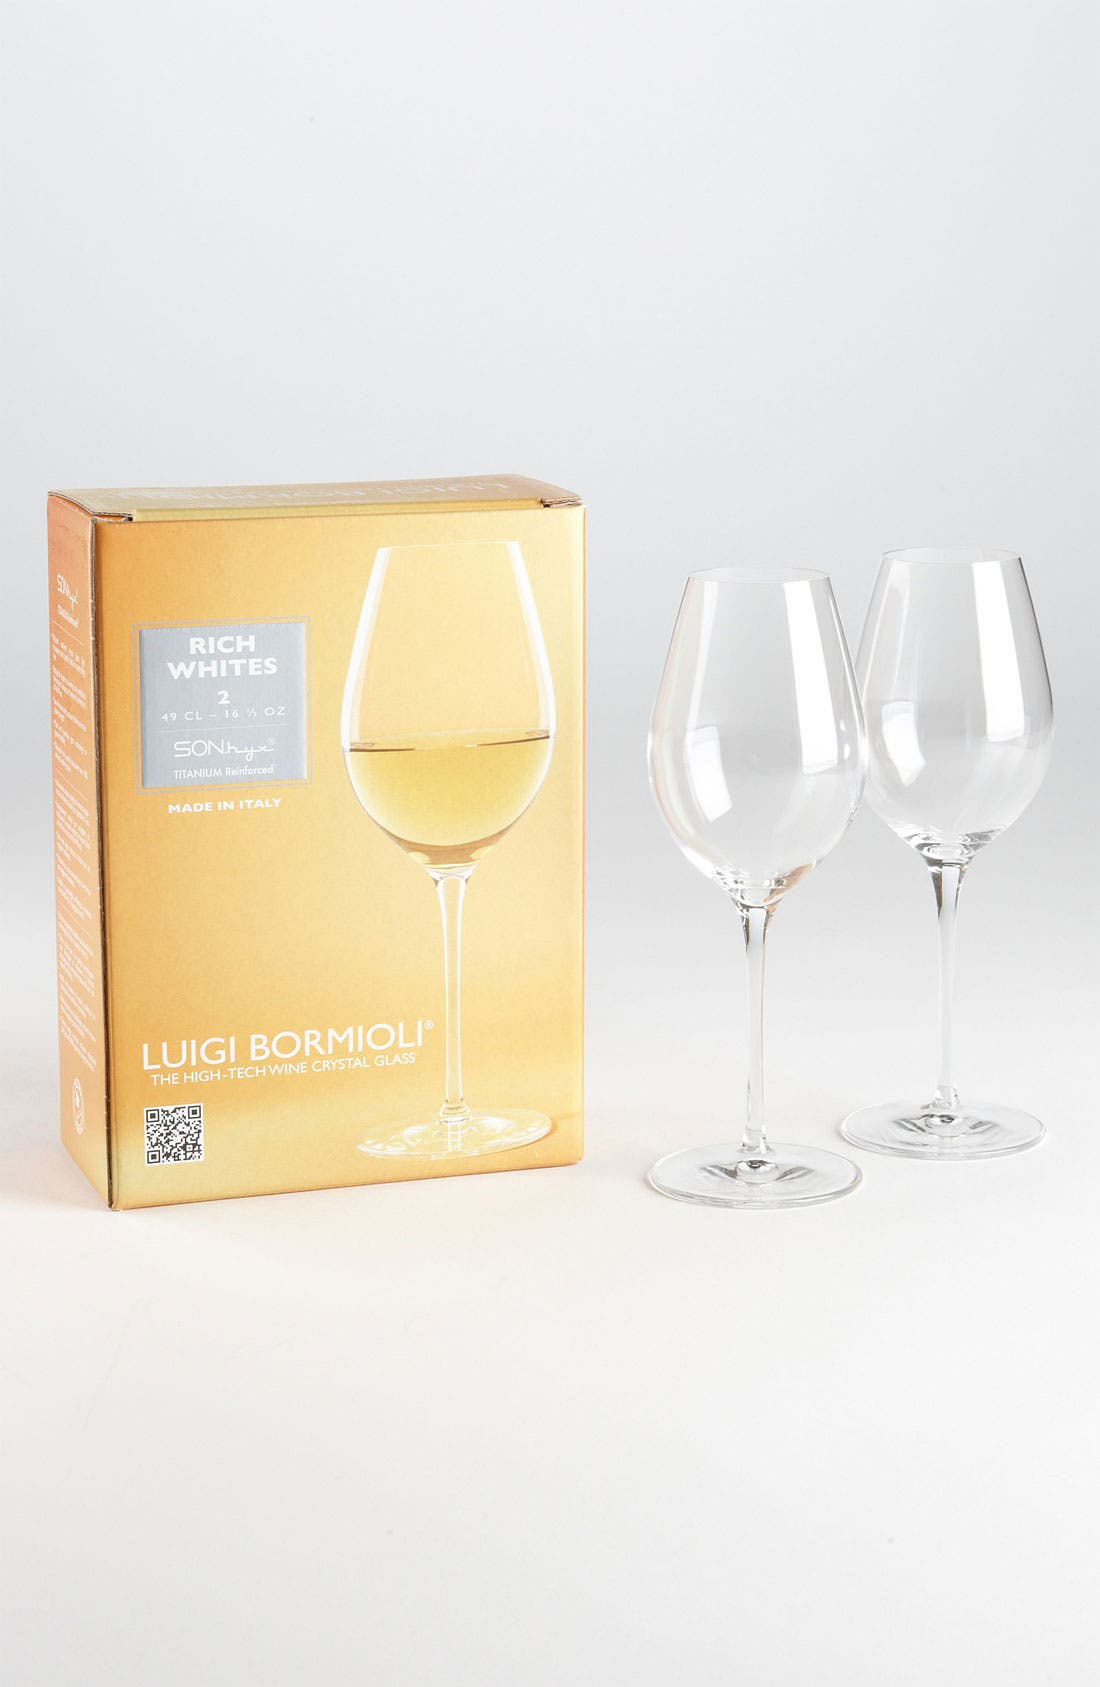 Main Image - Luigi Bormioli 'Wine Profiles - Rich Whites' Wine Glasses (Set of 2)